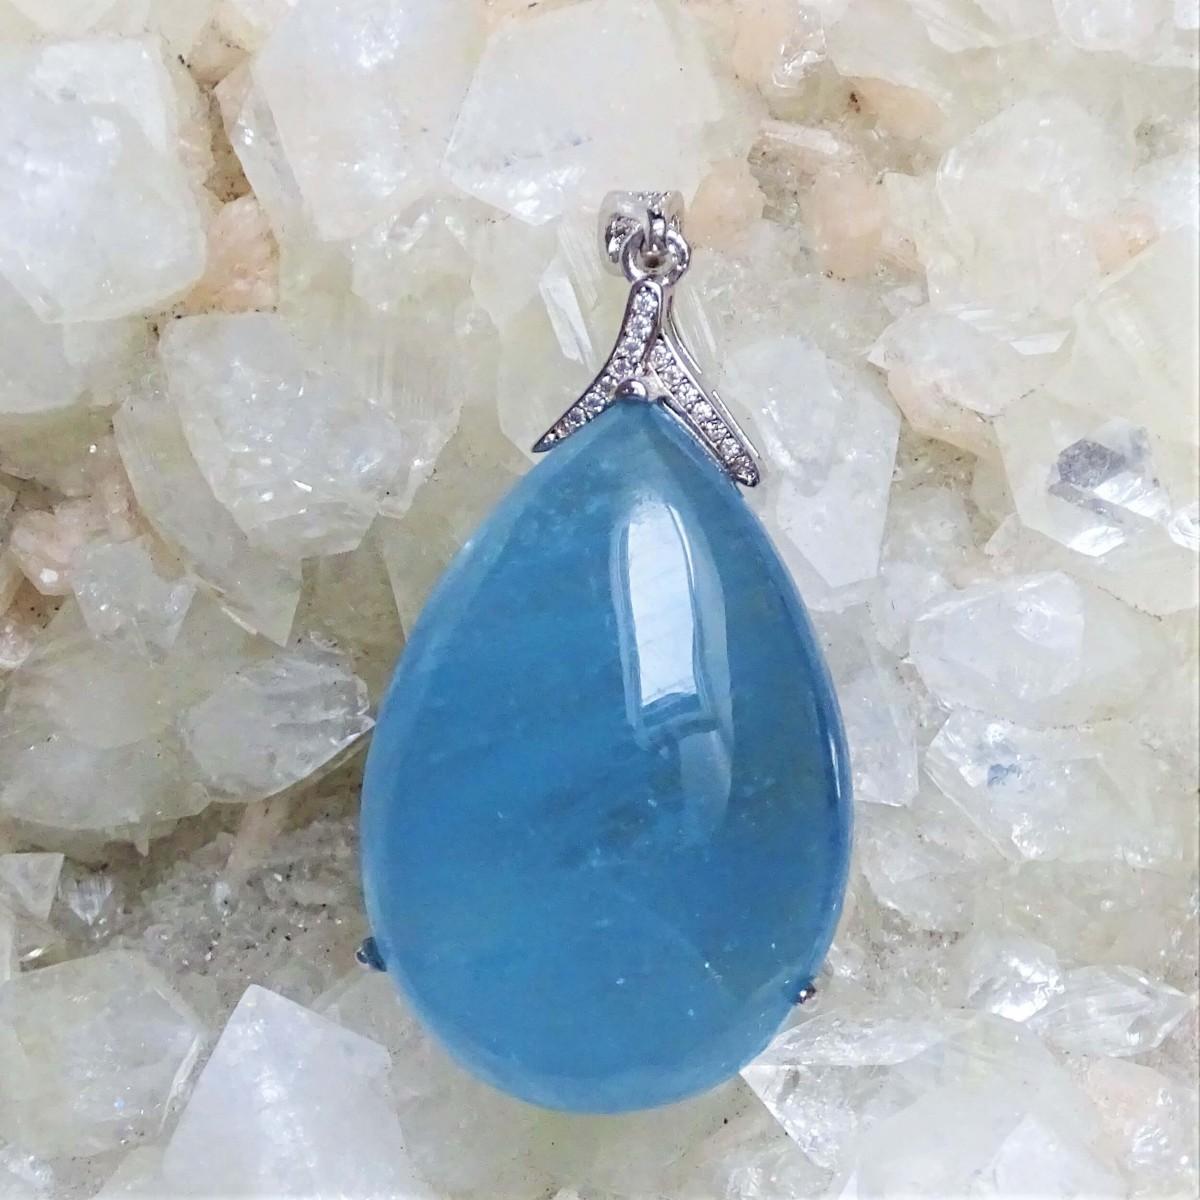 Aquamarine - pendant 17,1g, Brazil top quality